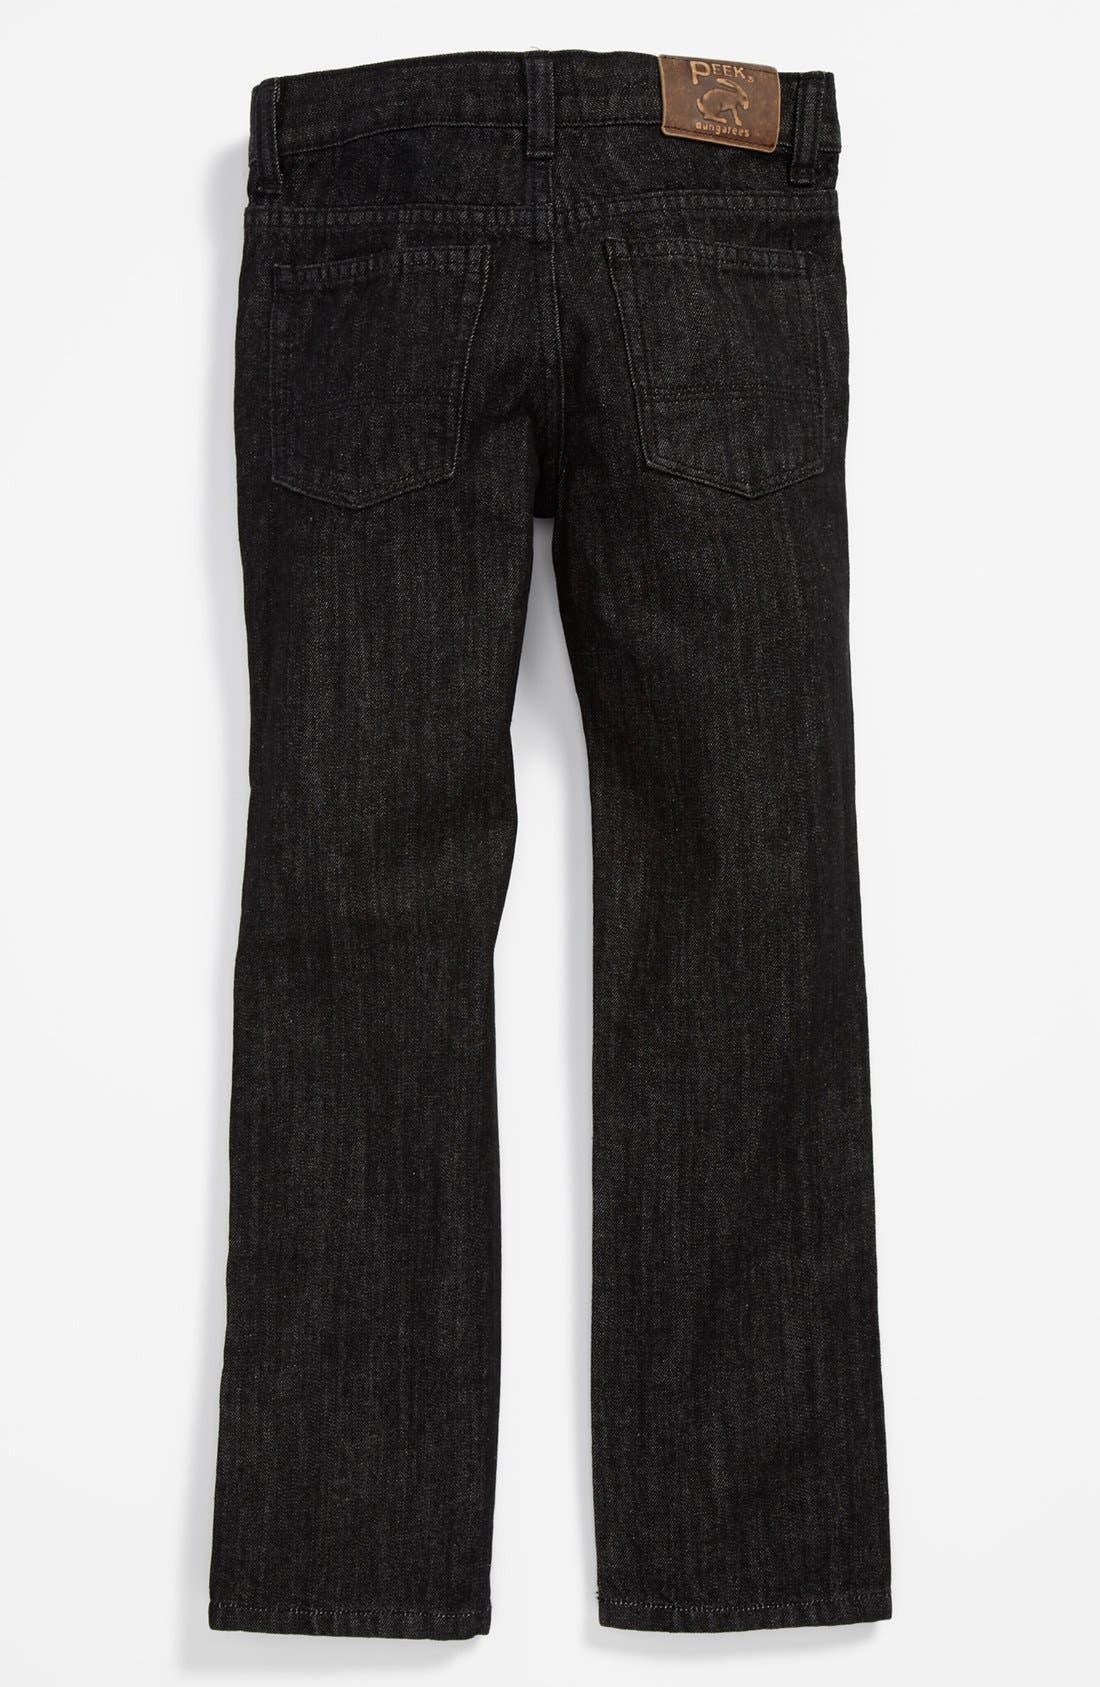 Main Image - Peek 'Ellis' Straight Leg Jeans (Toddler Boys, Little Boys & Big Boys)